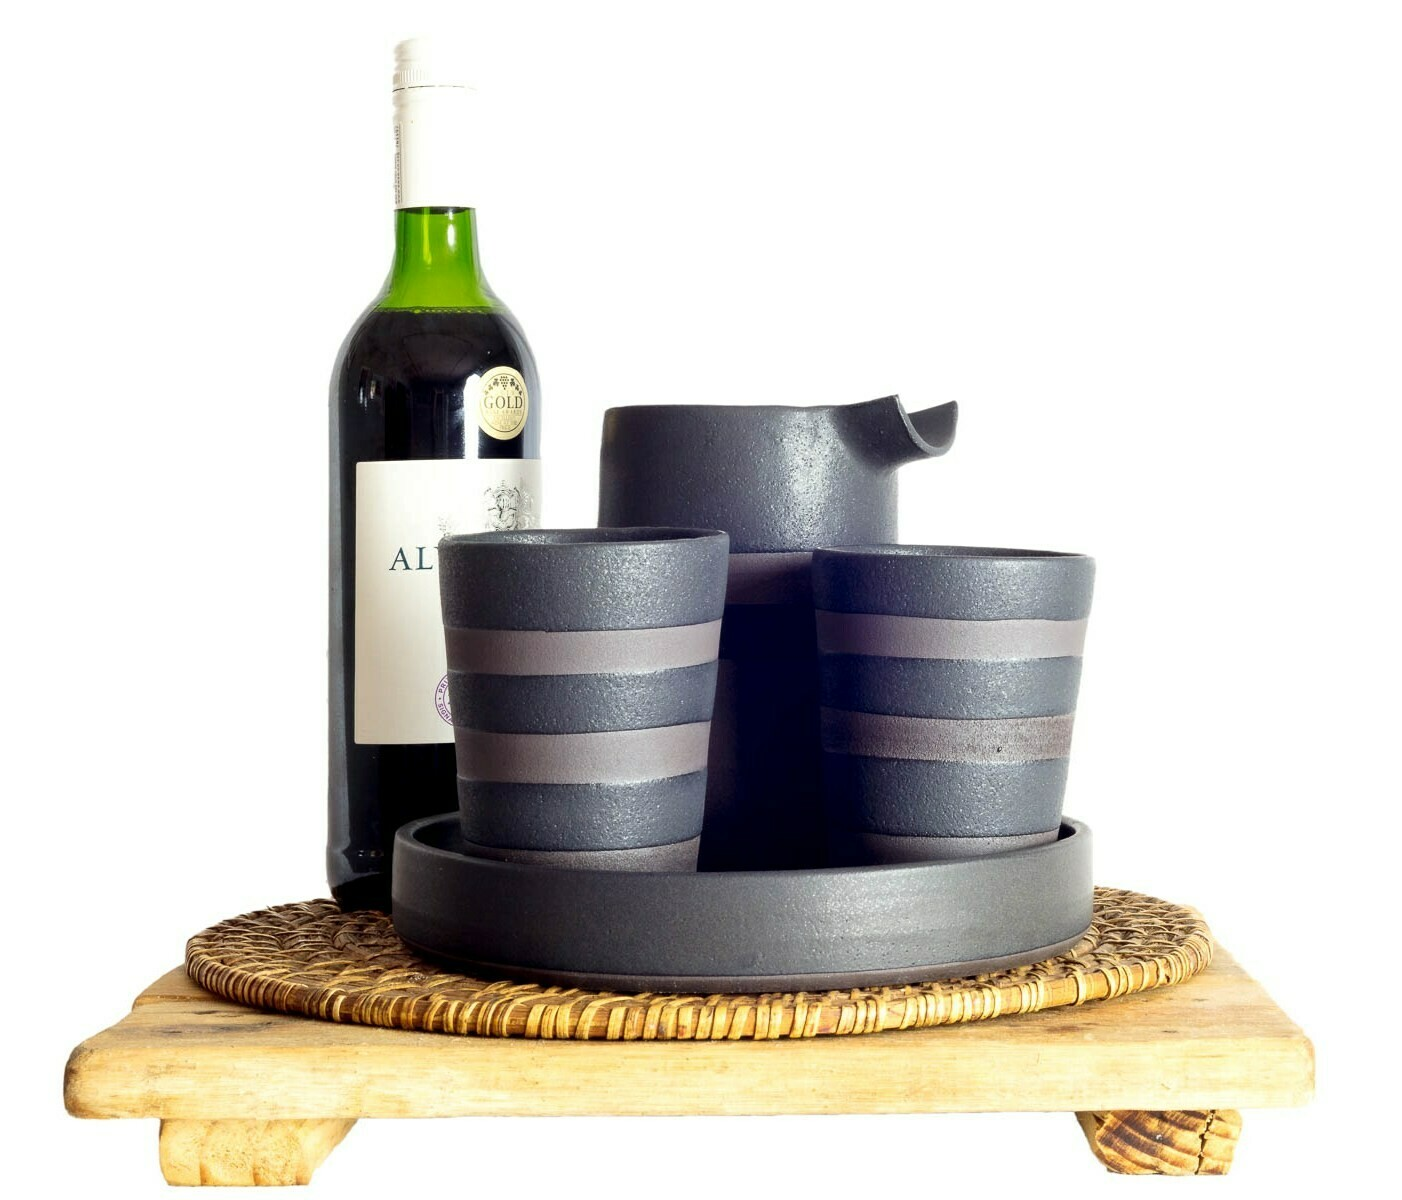 Set - Drinks - Sml - Wine/Water - Glasses - Striped